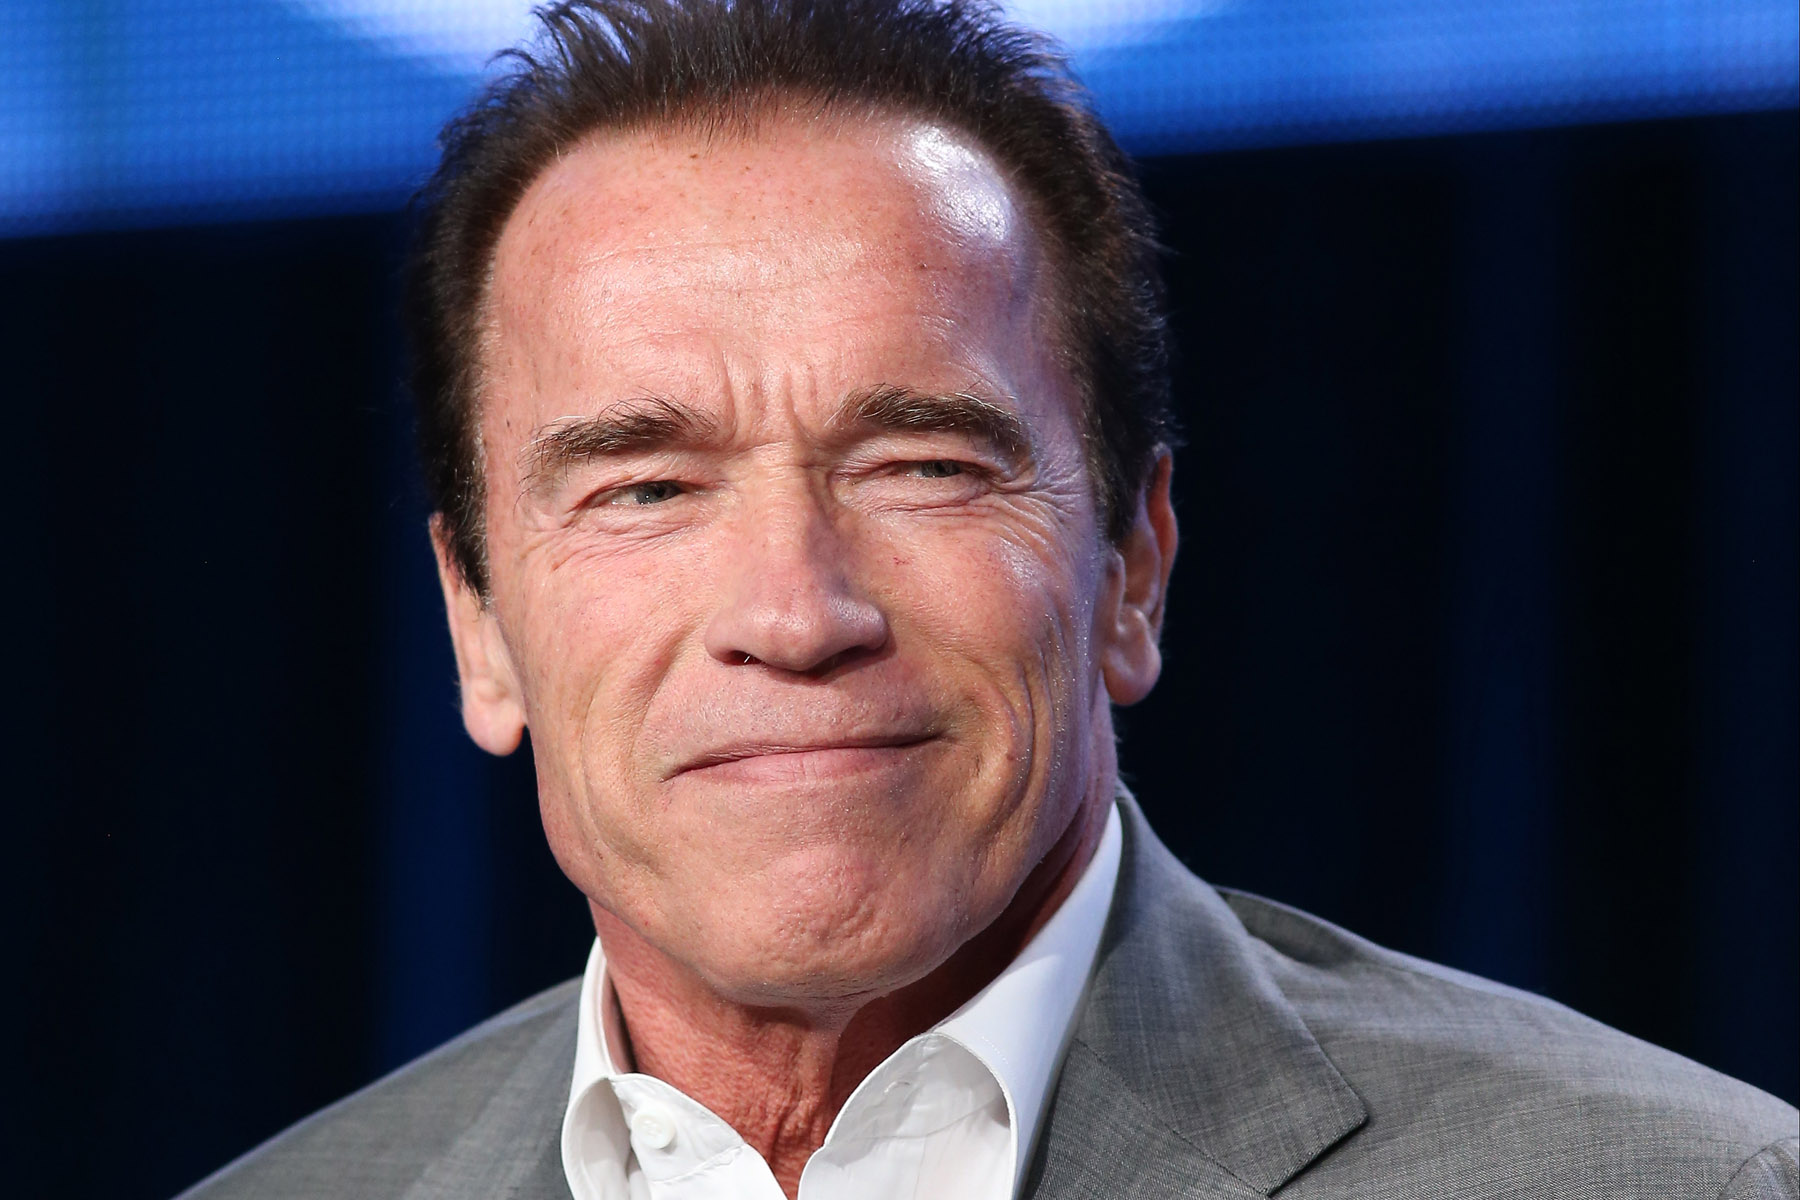 'Old but not obsolete' Schwarzenegger back again as Terminator